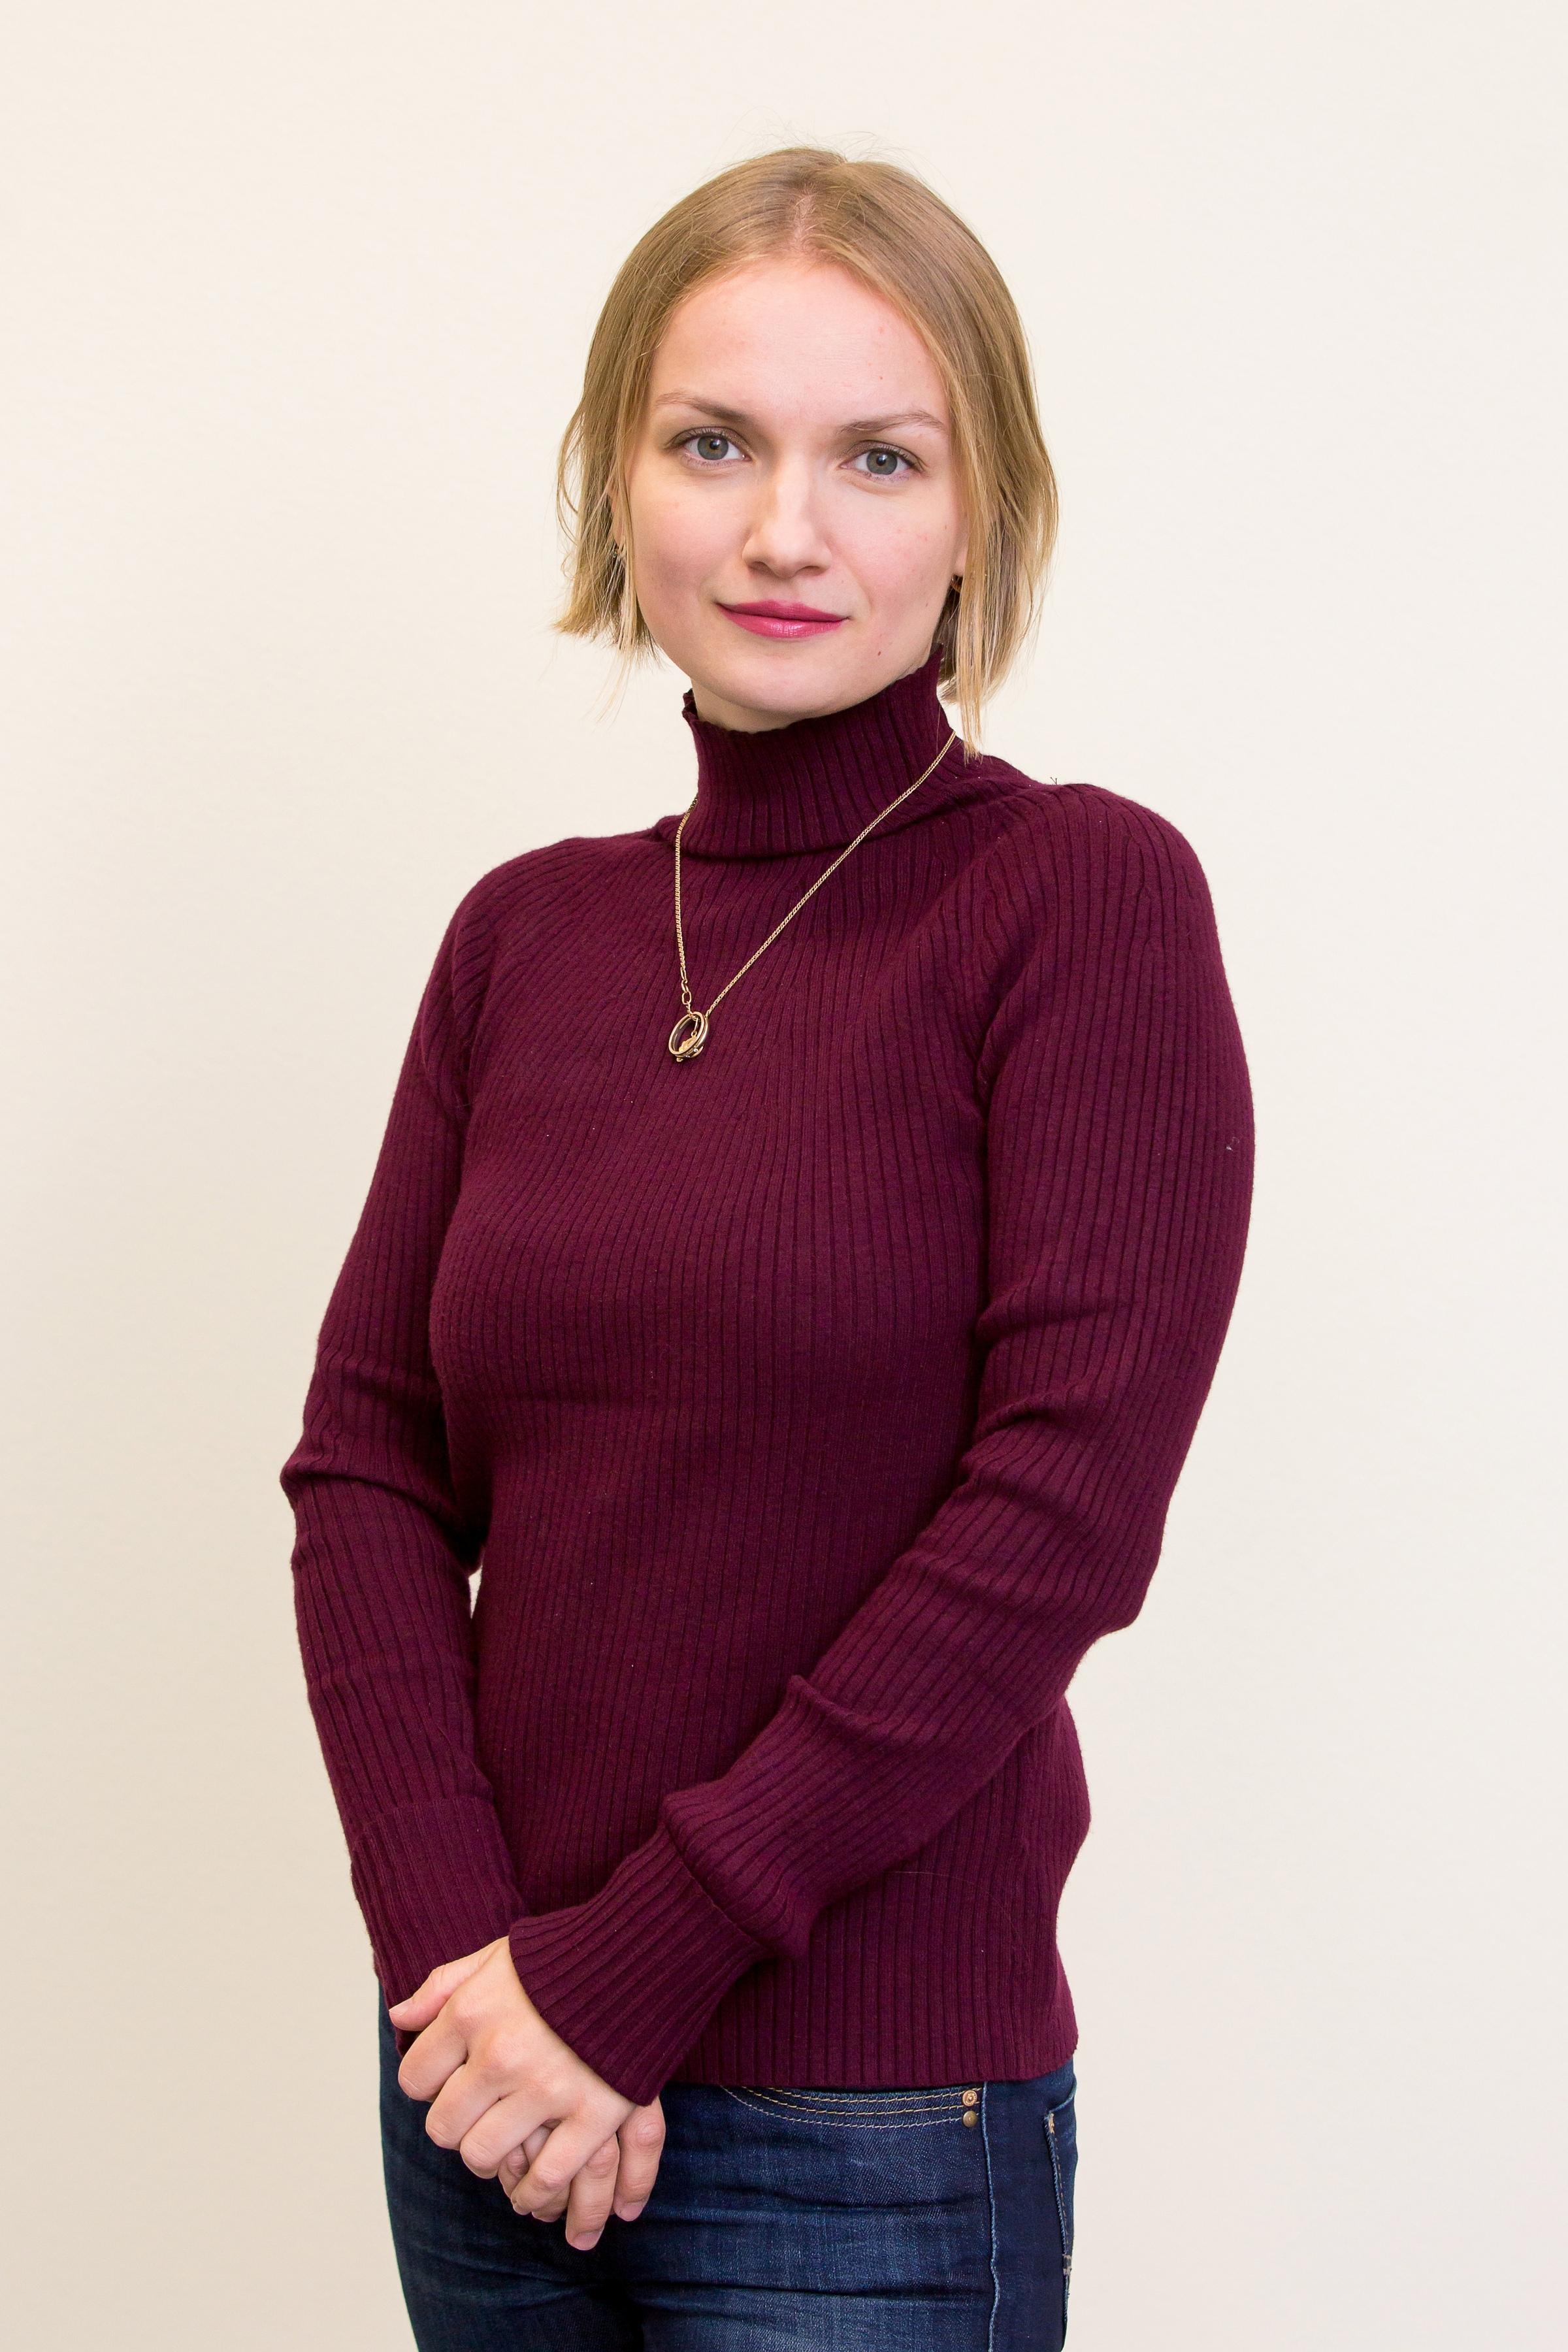 Daria Illarionova